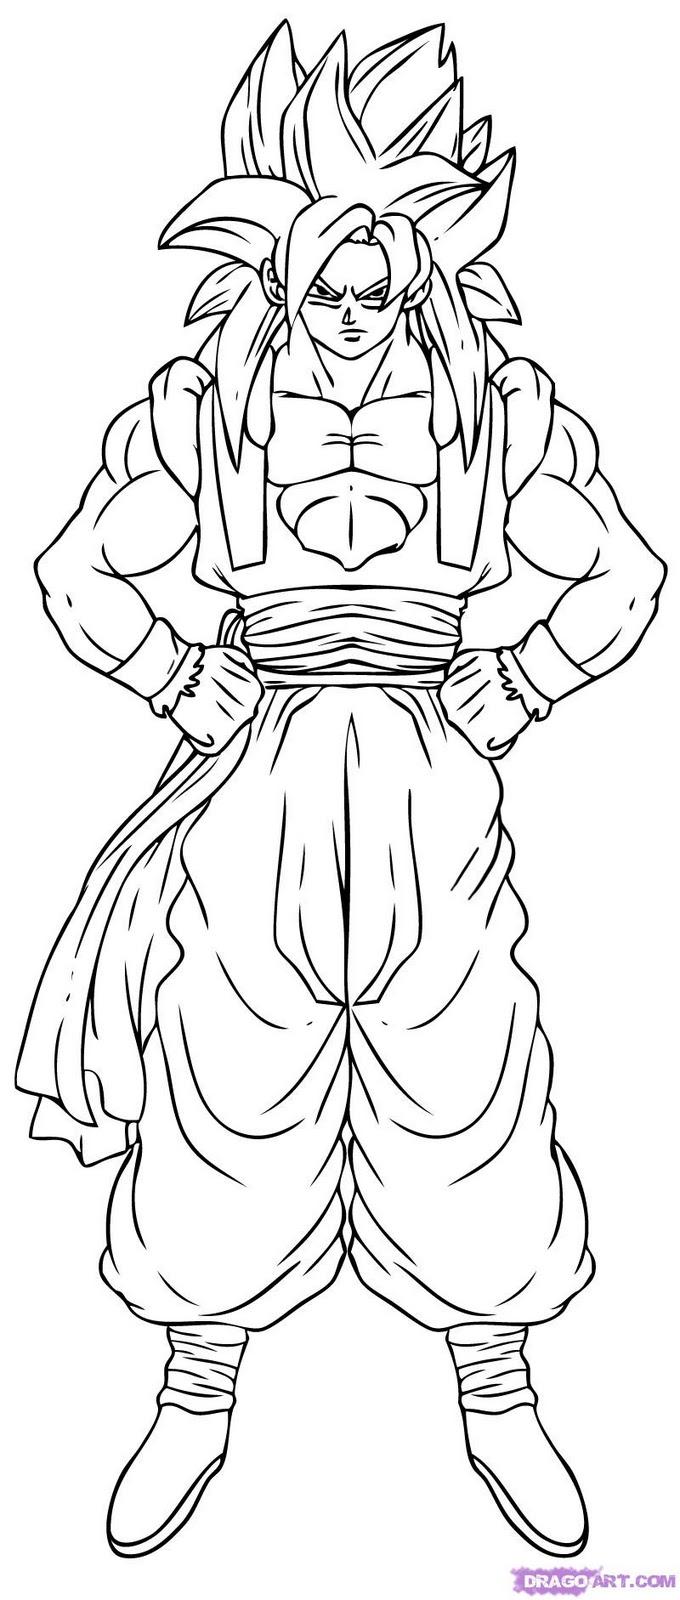 Dibujos para colorear goku fase 4 - Imagui